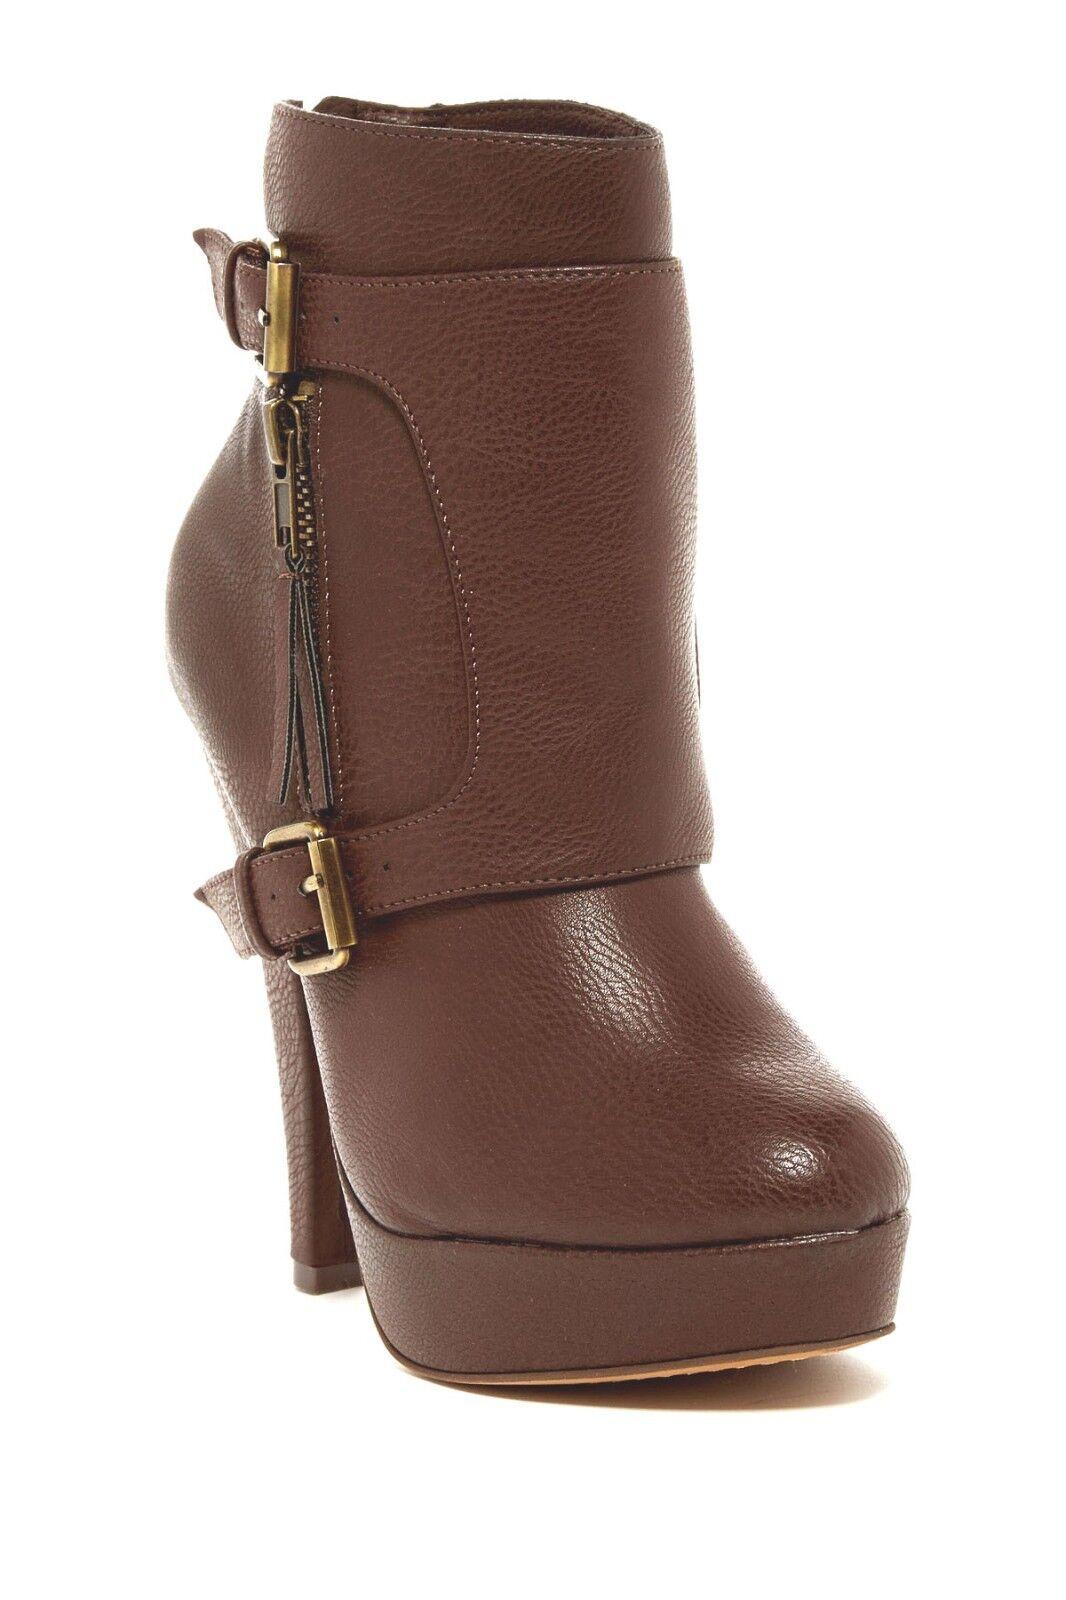 New Charles by Charles David Women's Birgit Birgit Birgit leather Boots size 9.5 876073